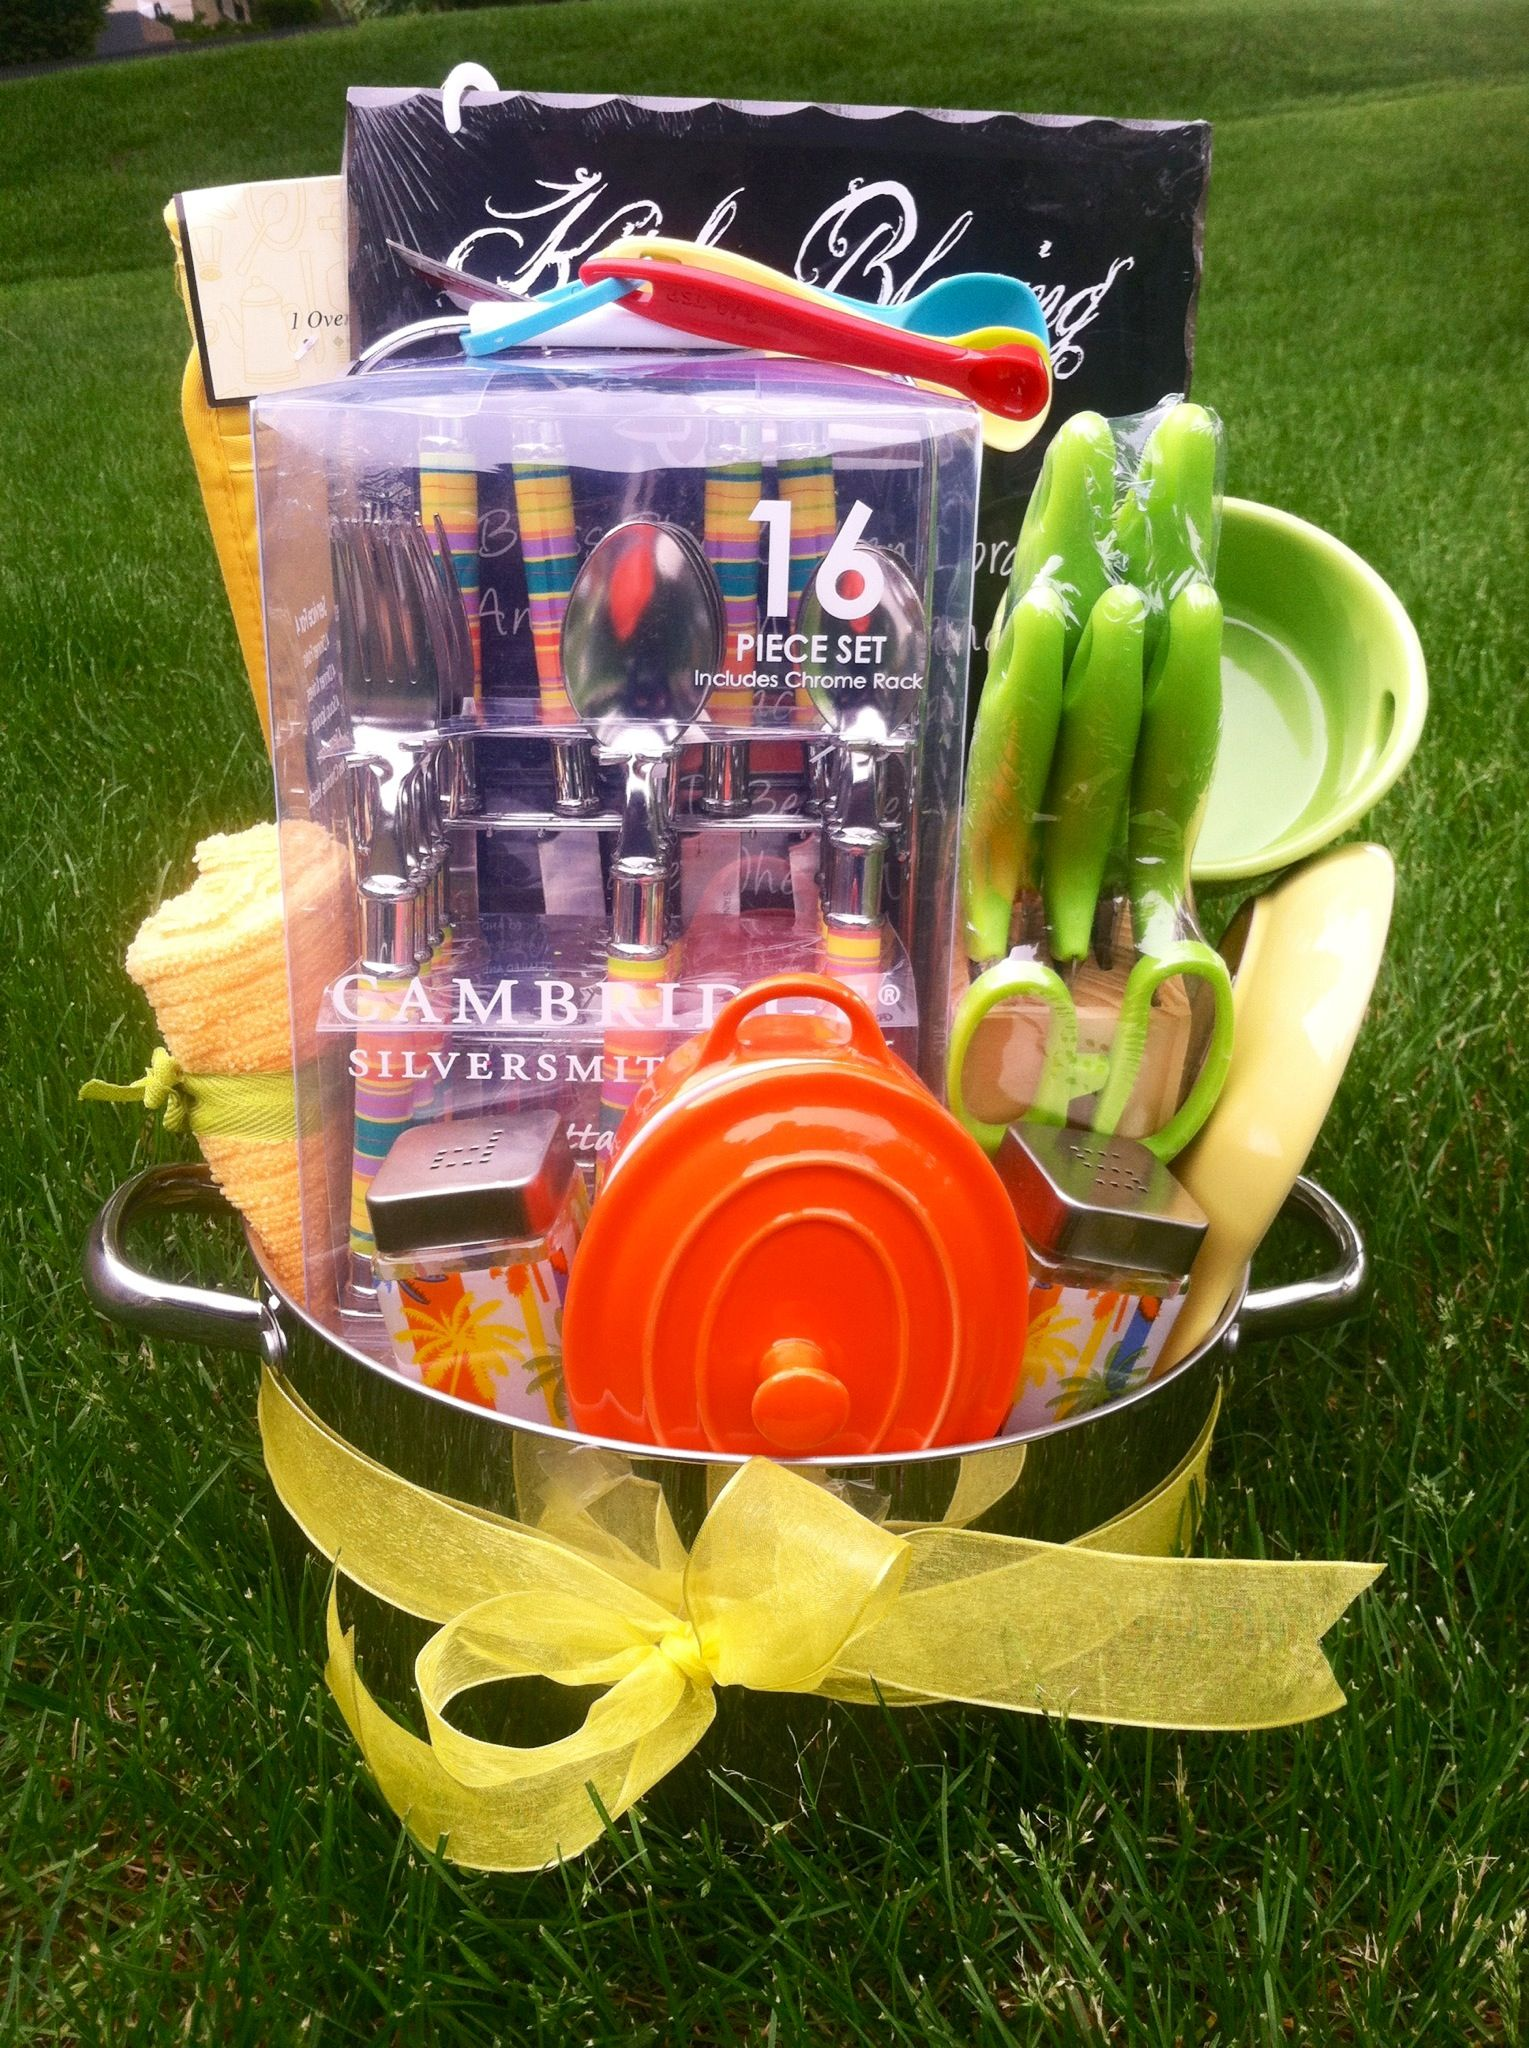 Kitchen raffle basket | Gift Ideas | Raffle gift basket ideas ... on food ideas for fundraisers, basket fundraising ideas, themed baskets for fundraisers, basket raffle flyer, gift baskets for fundraisers, best raffle baskets for fundraisers, basket raffle fundraiser themes,